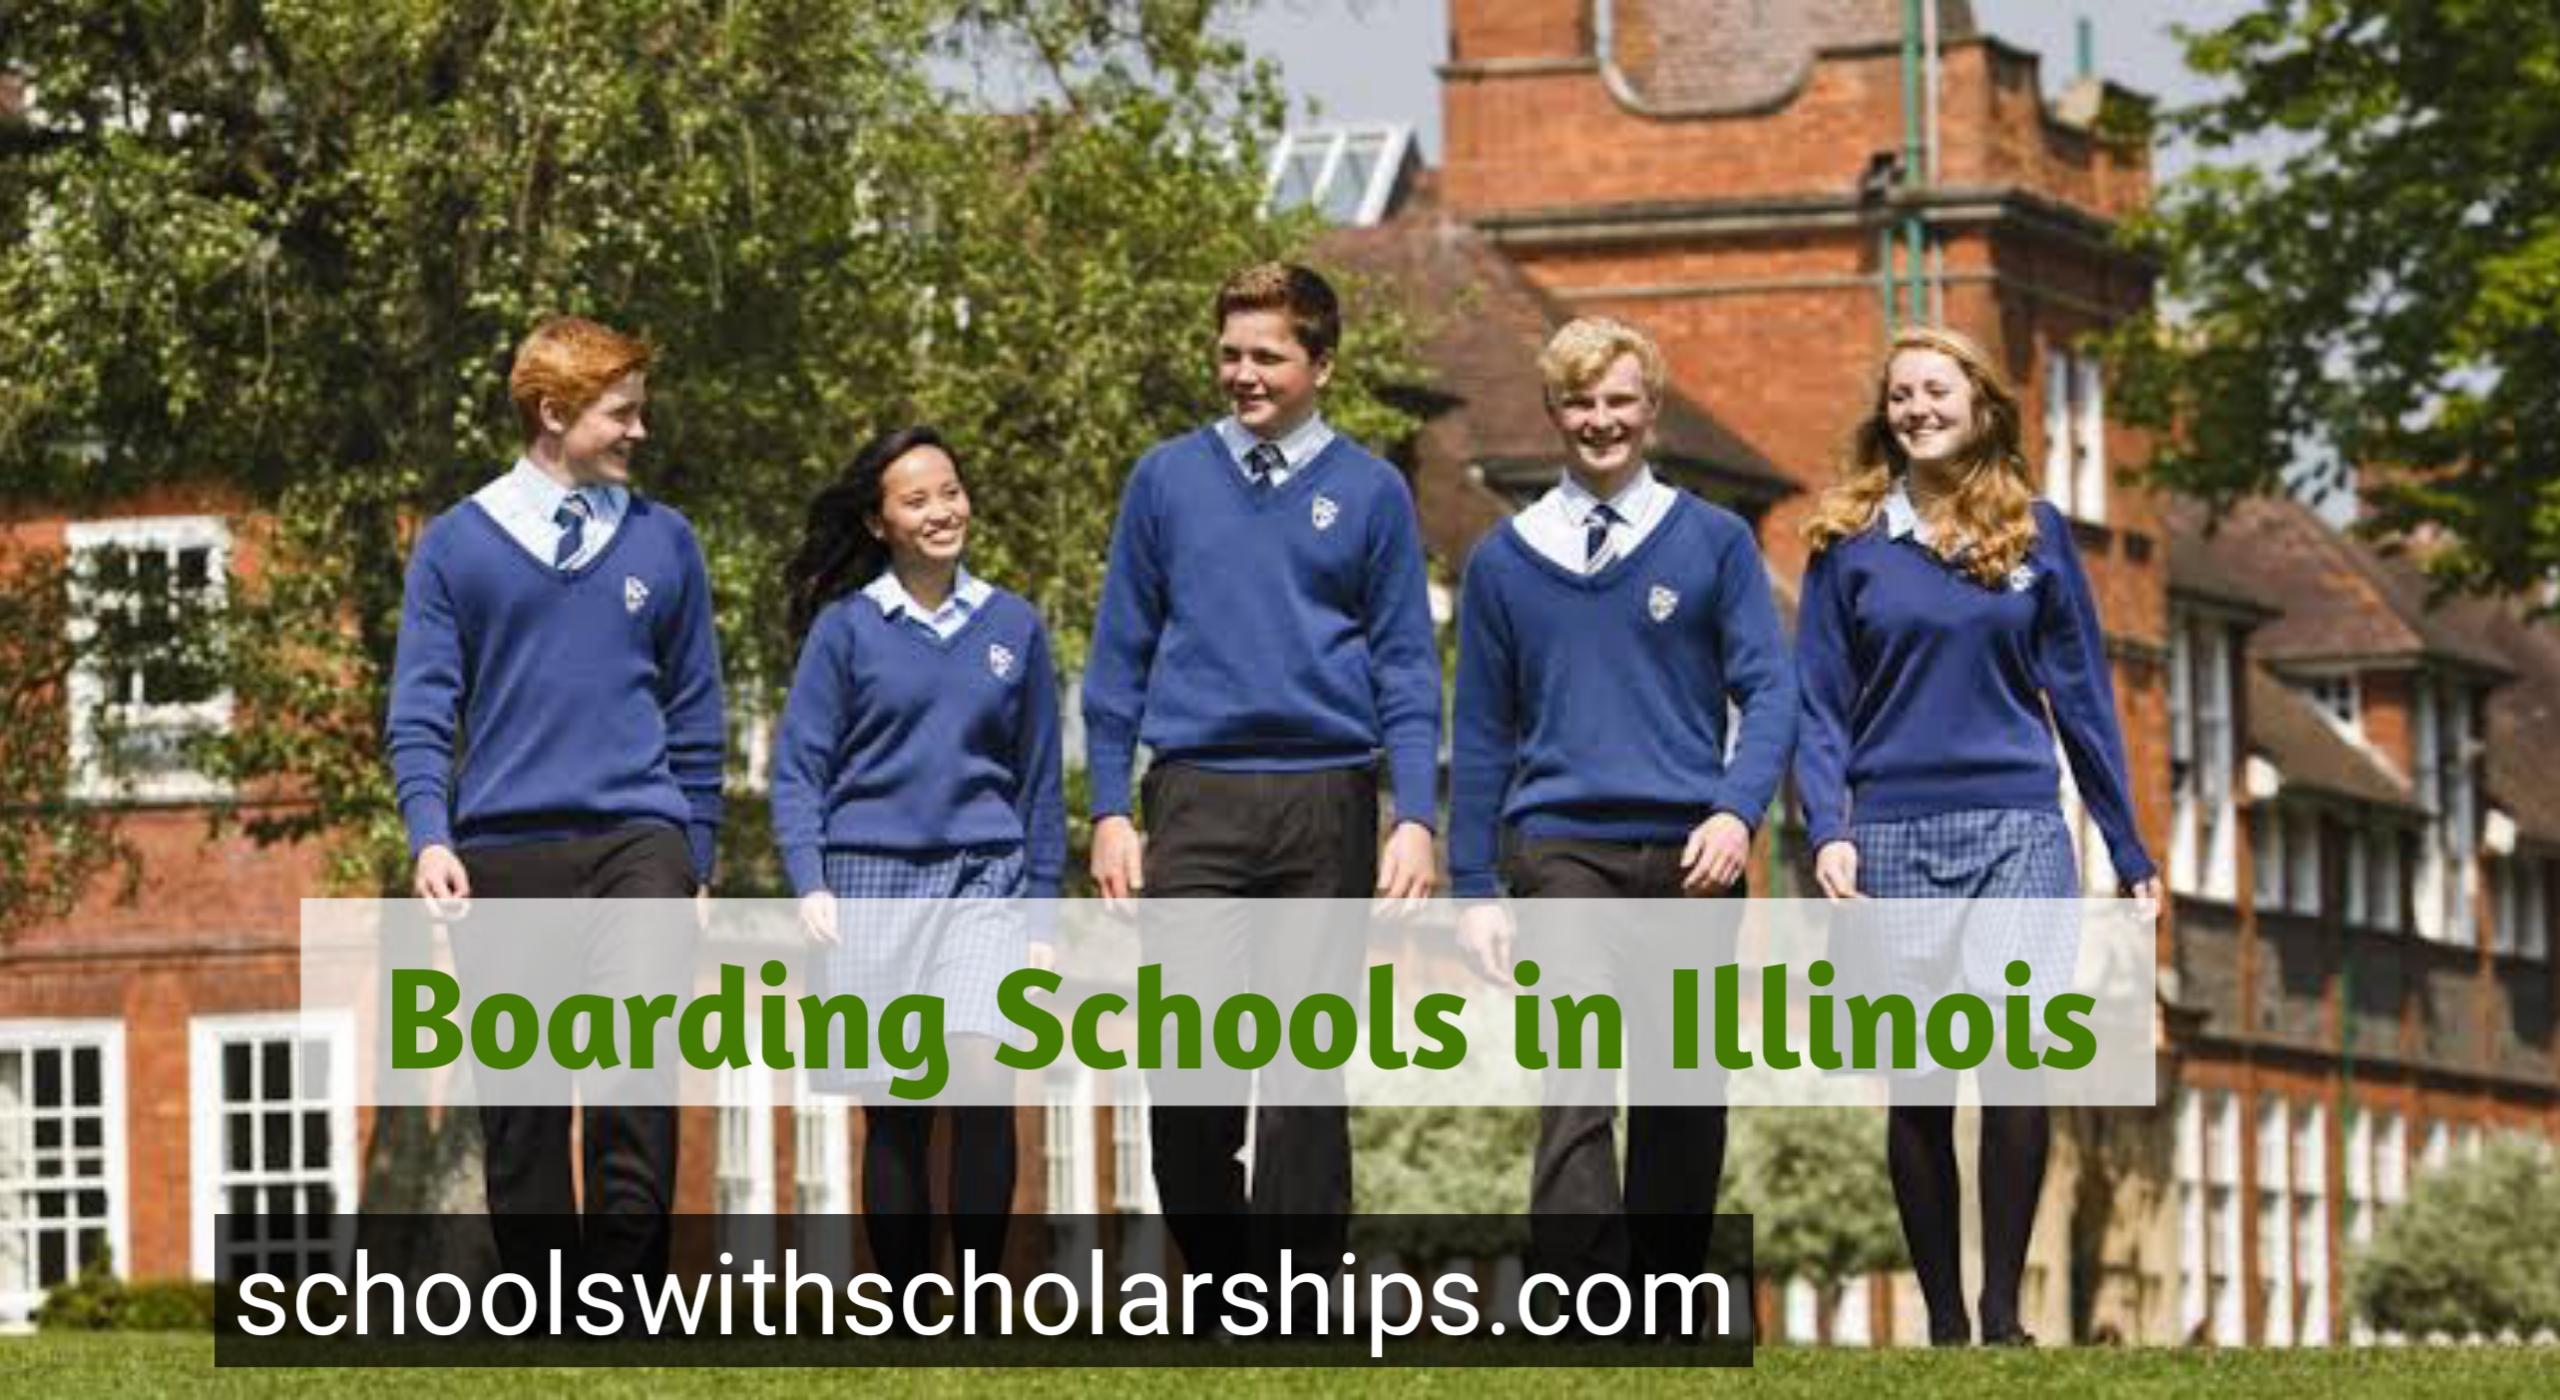 Boarding Schools in Illinois